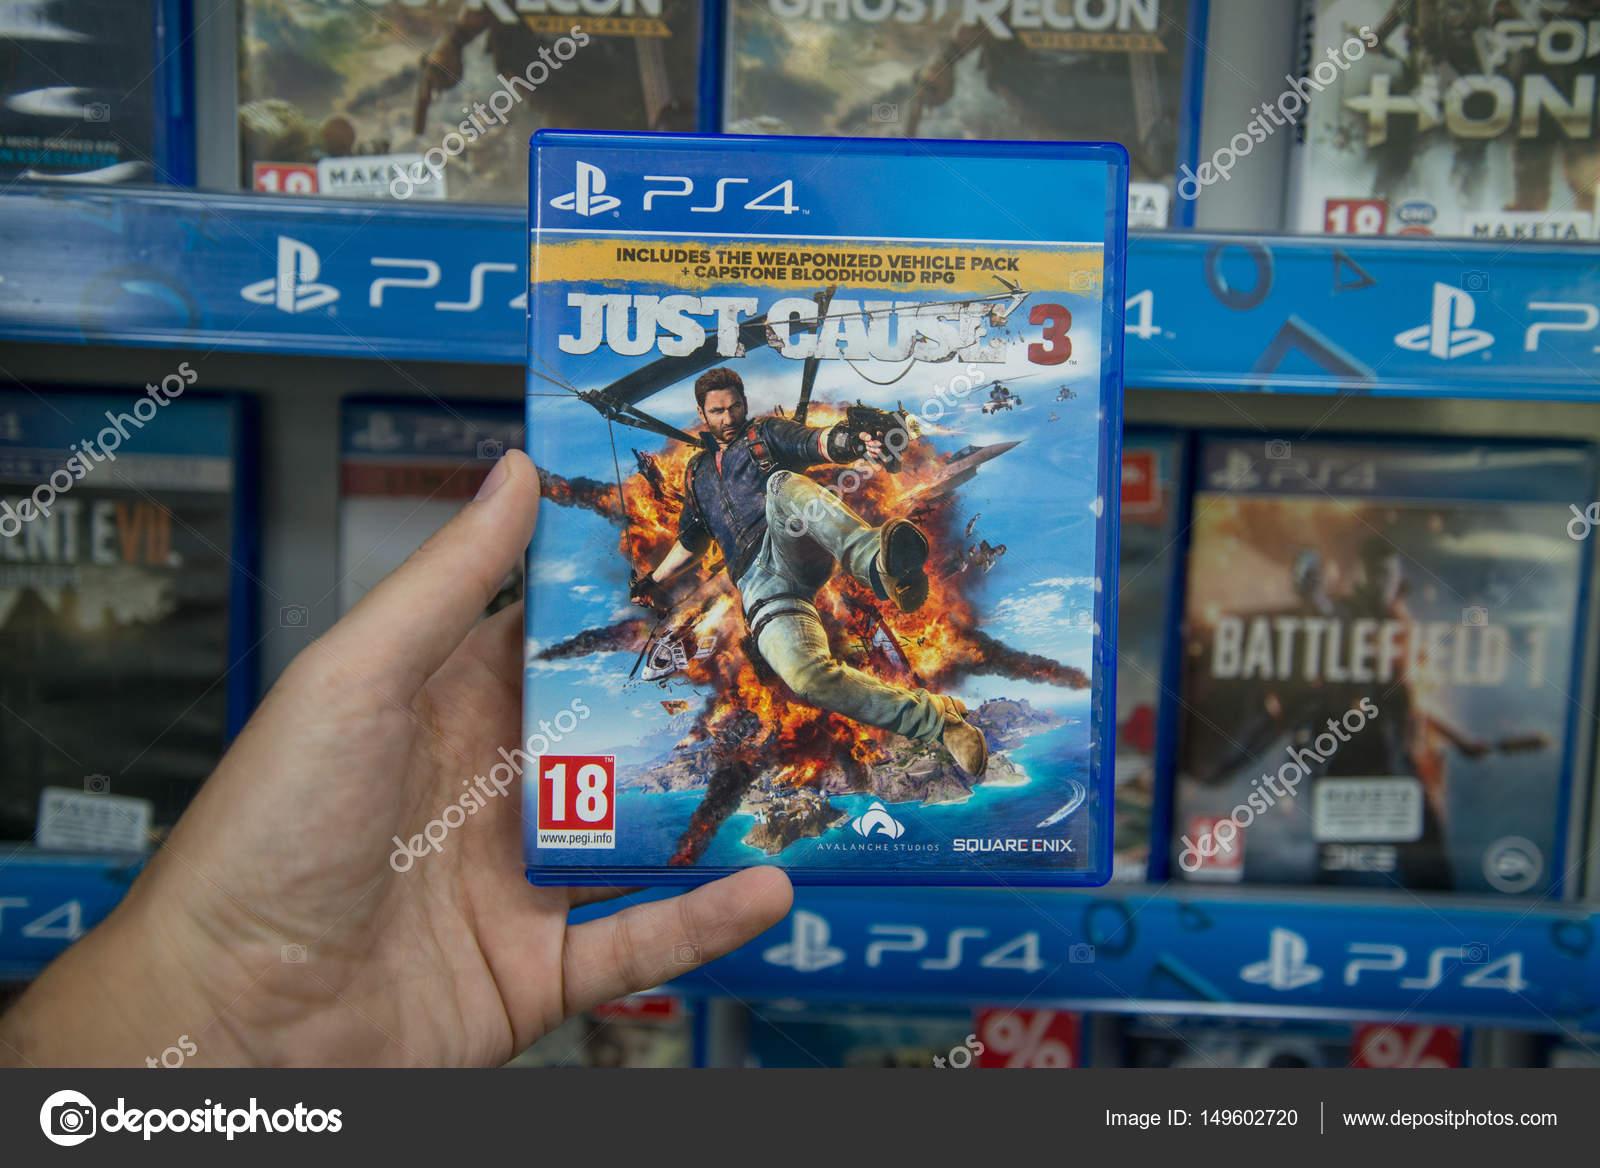 Just Cause 3 Jeux Vido Sur Sony Playstation 4 Photo Ditoriale Ps4 Gold Edition Bratislava Slovaquie Vers Avril 2017 Homme Tenant Juste Jeu Console En Magasin Image De Pe3check